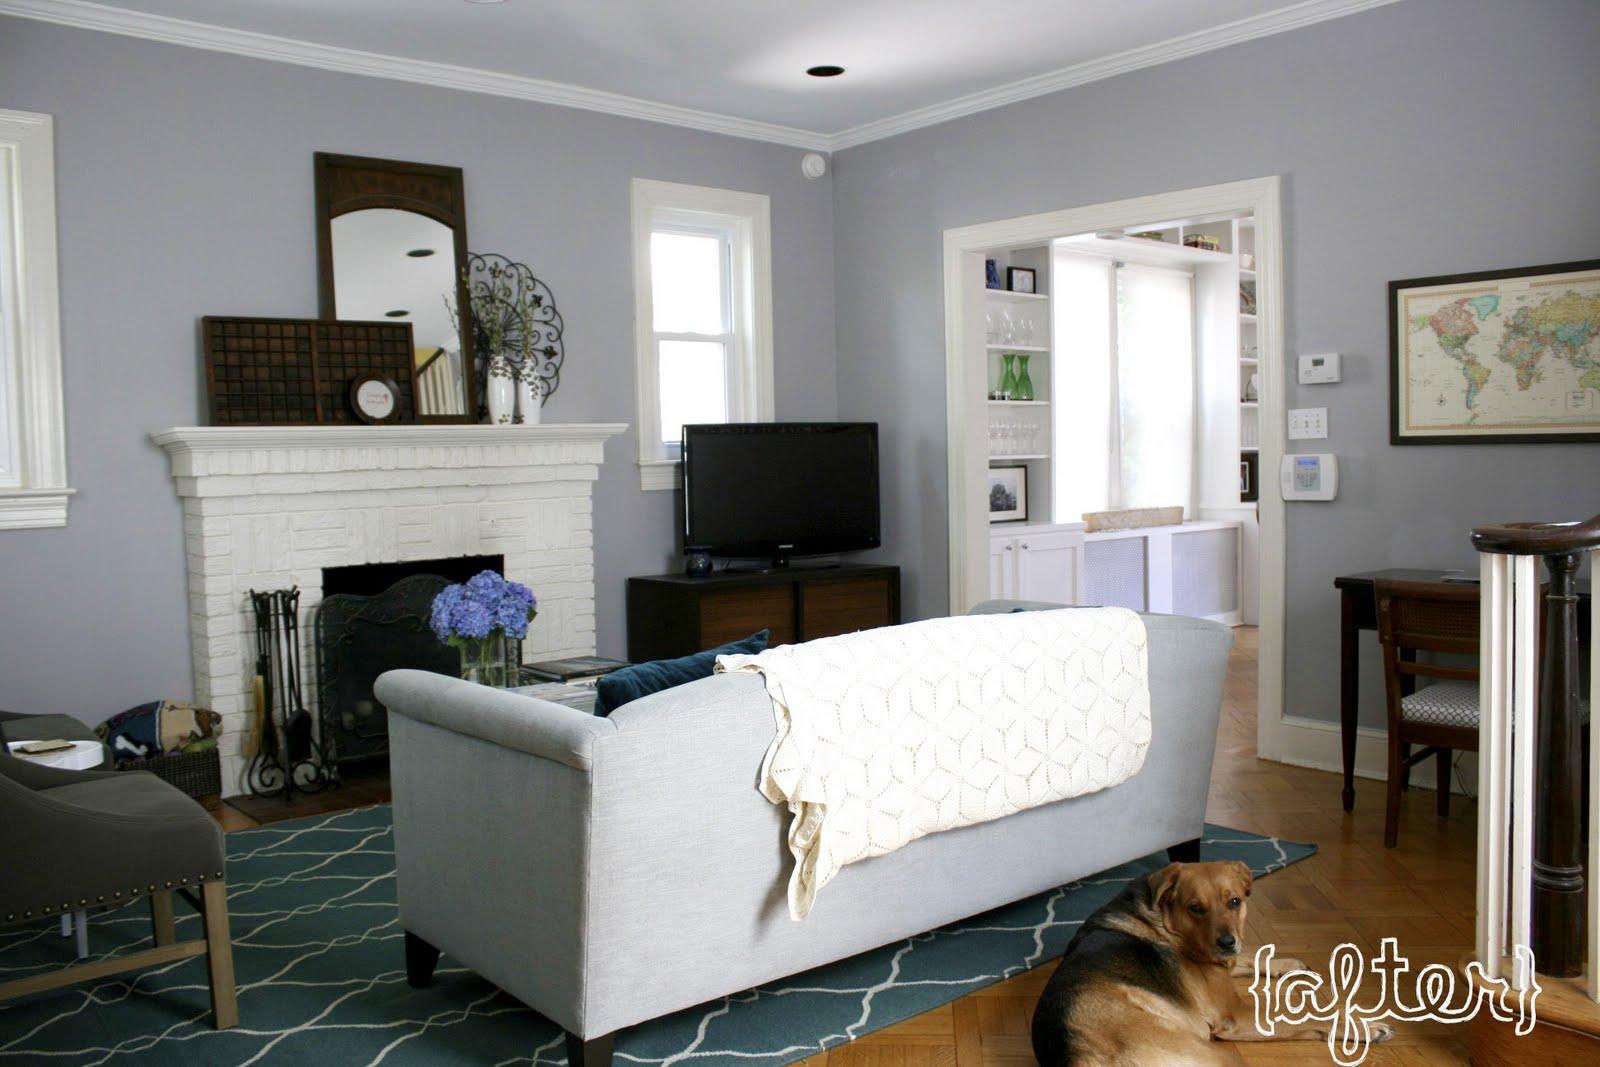 Rustoleum Veresus Behr Deck Paint | Home Design Ideas